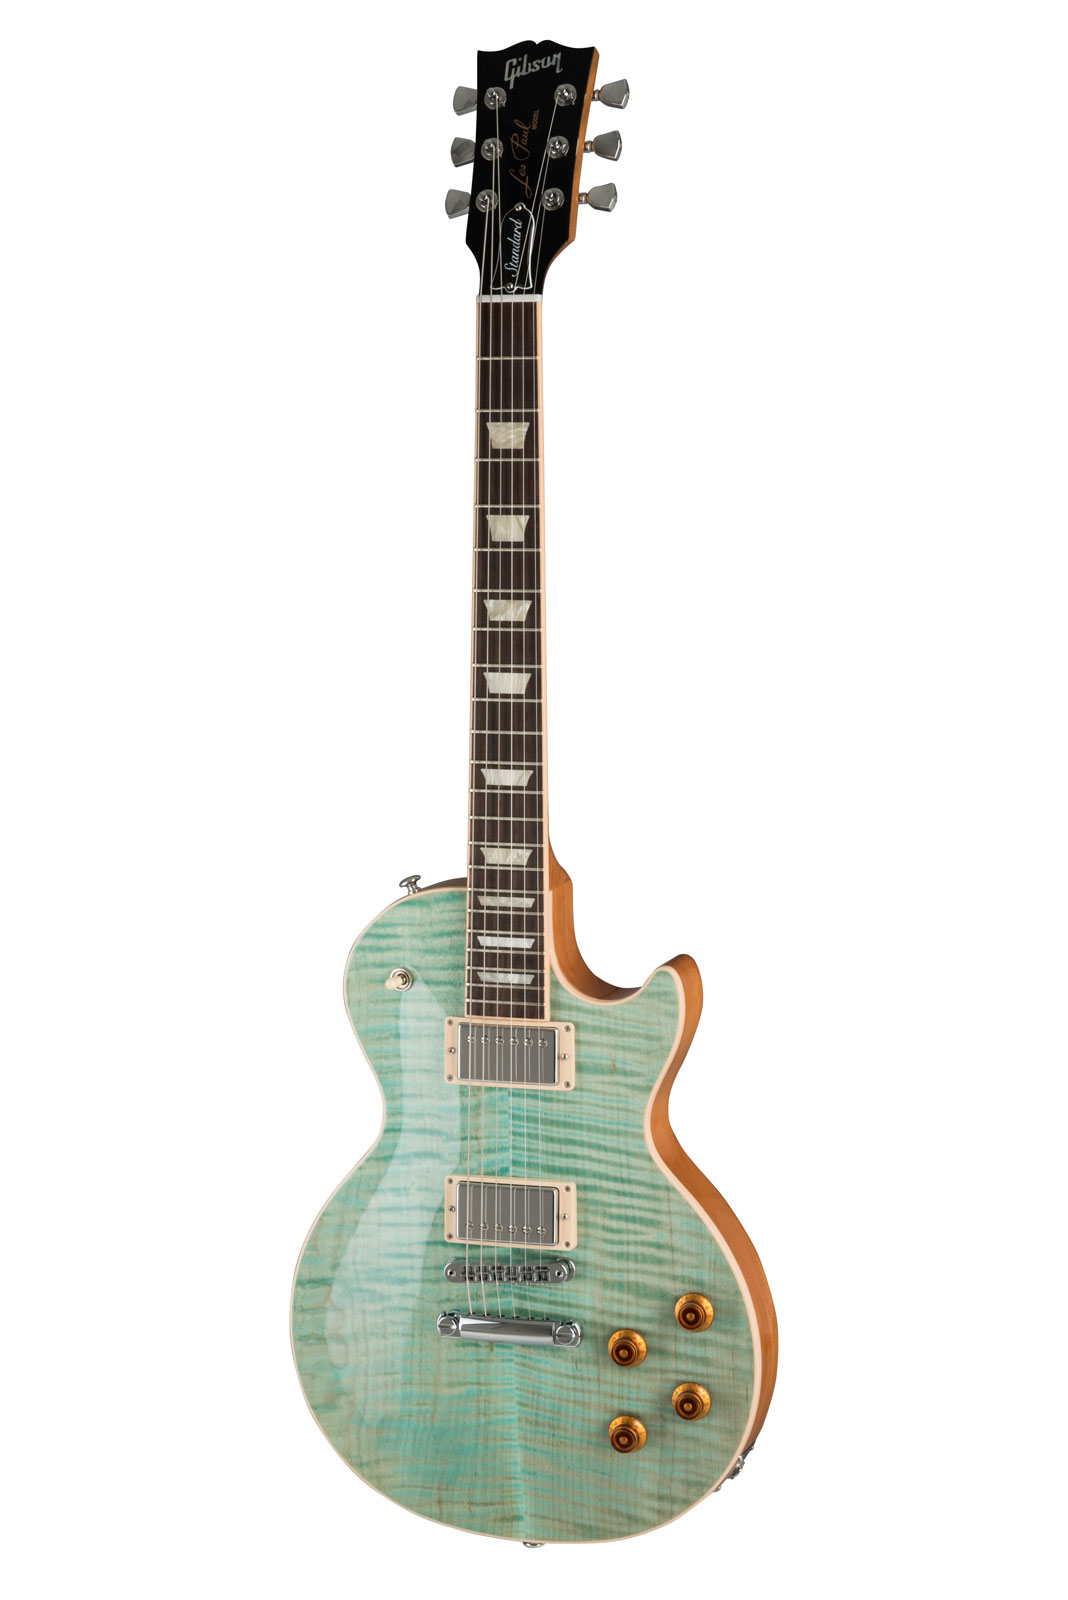 Gibson Les Paul Standard 2019 Seafoam Green 2019